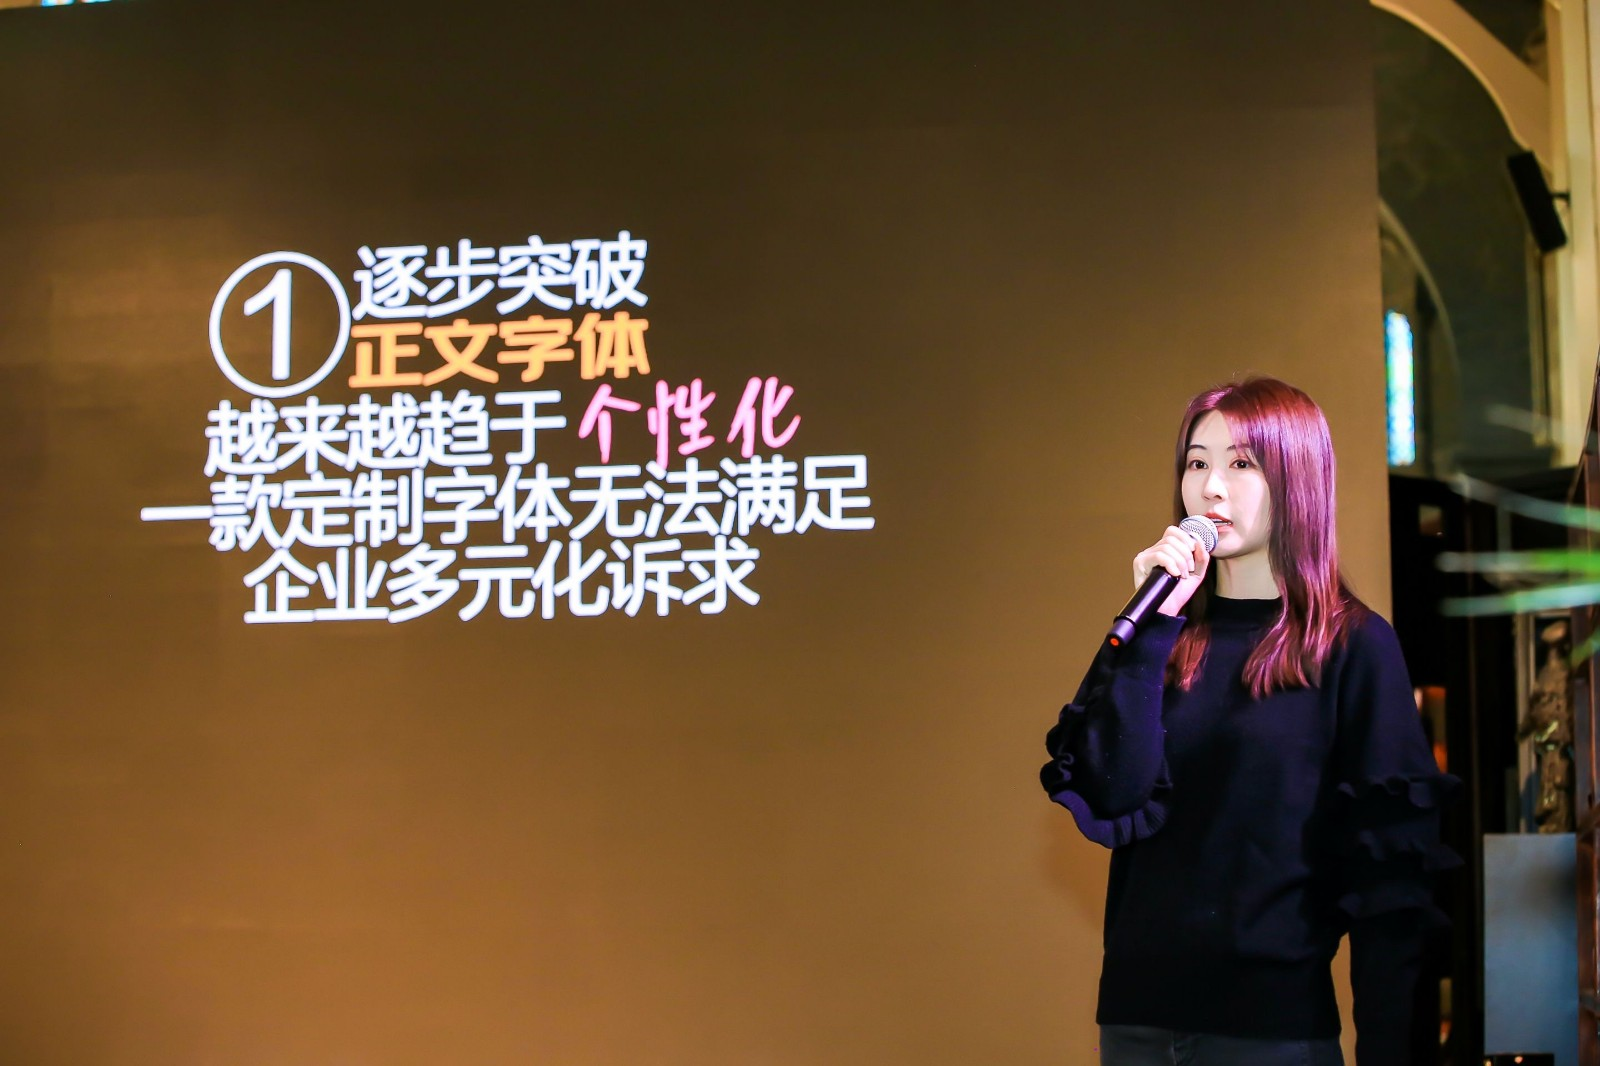 https://ft-bk1.oss-cn-zhangjiakou.aliyuncs.com/Public/Uploads/img/n_content_20201210175330_3697.jpg